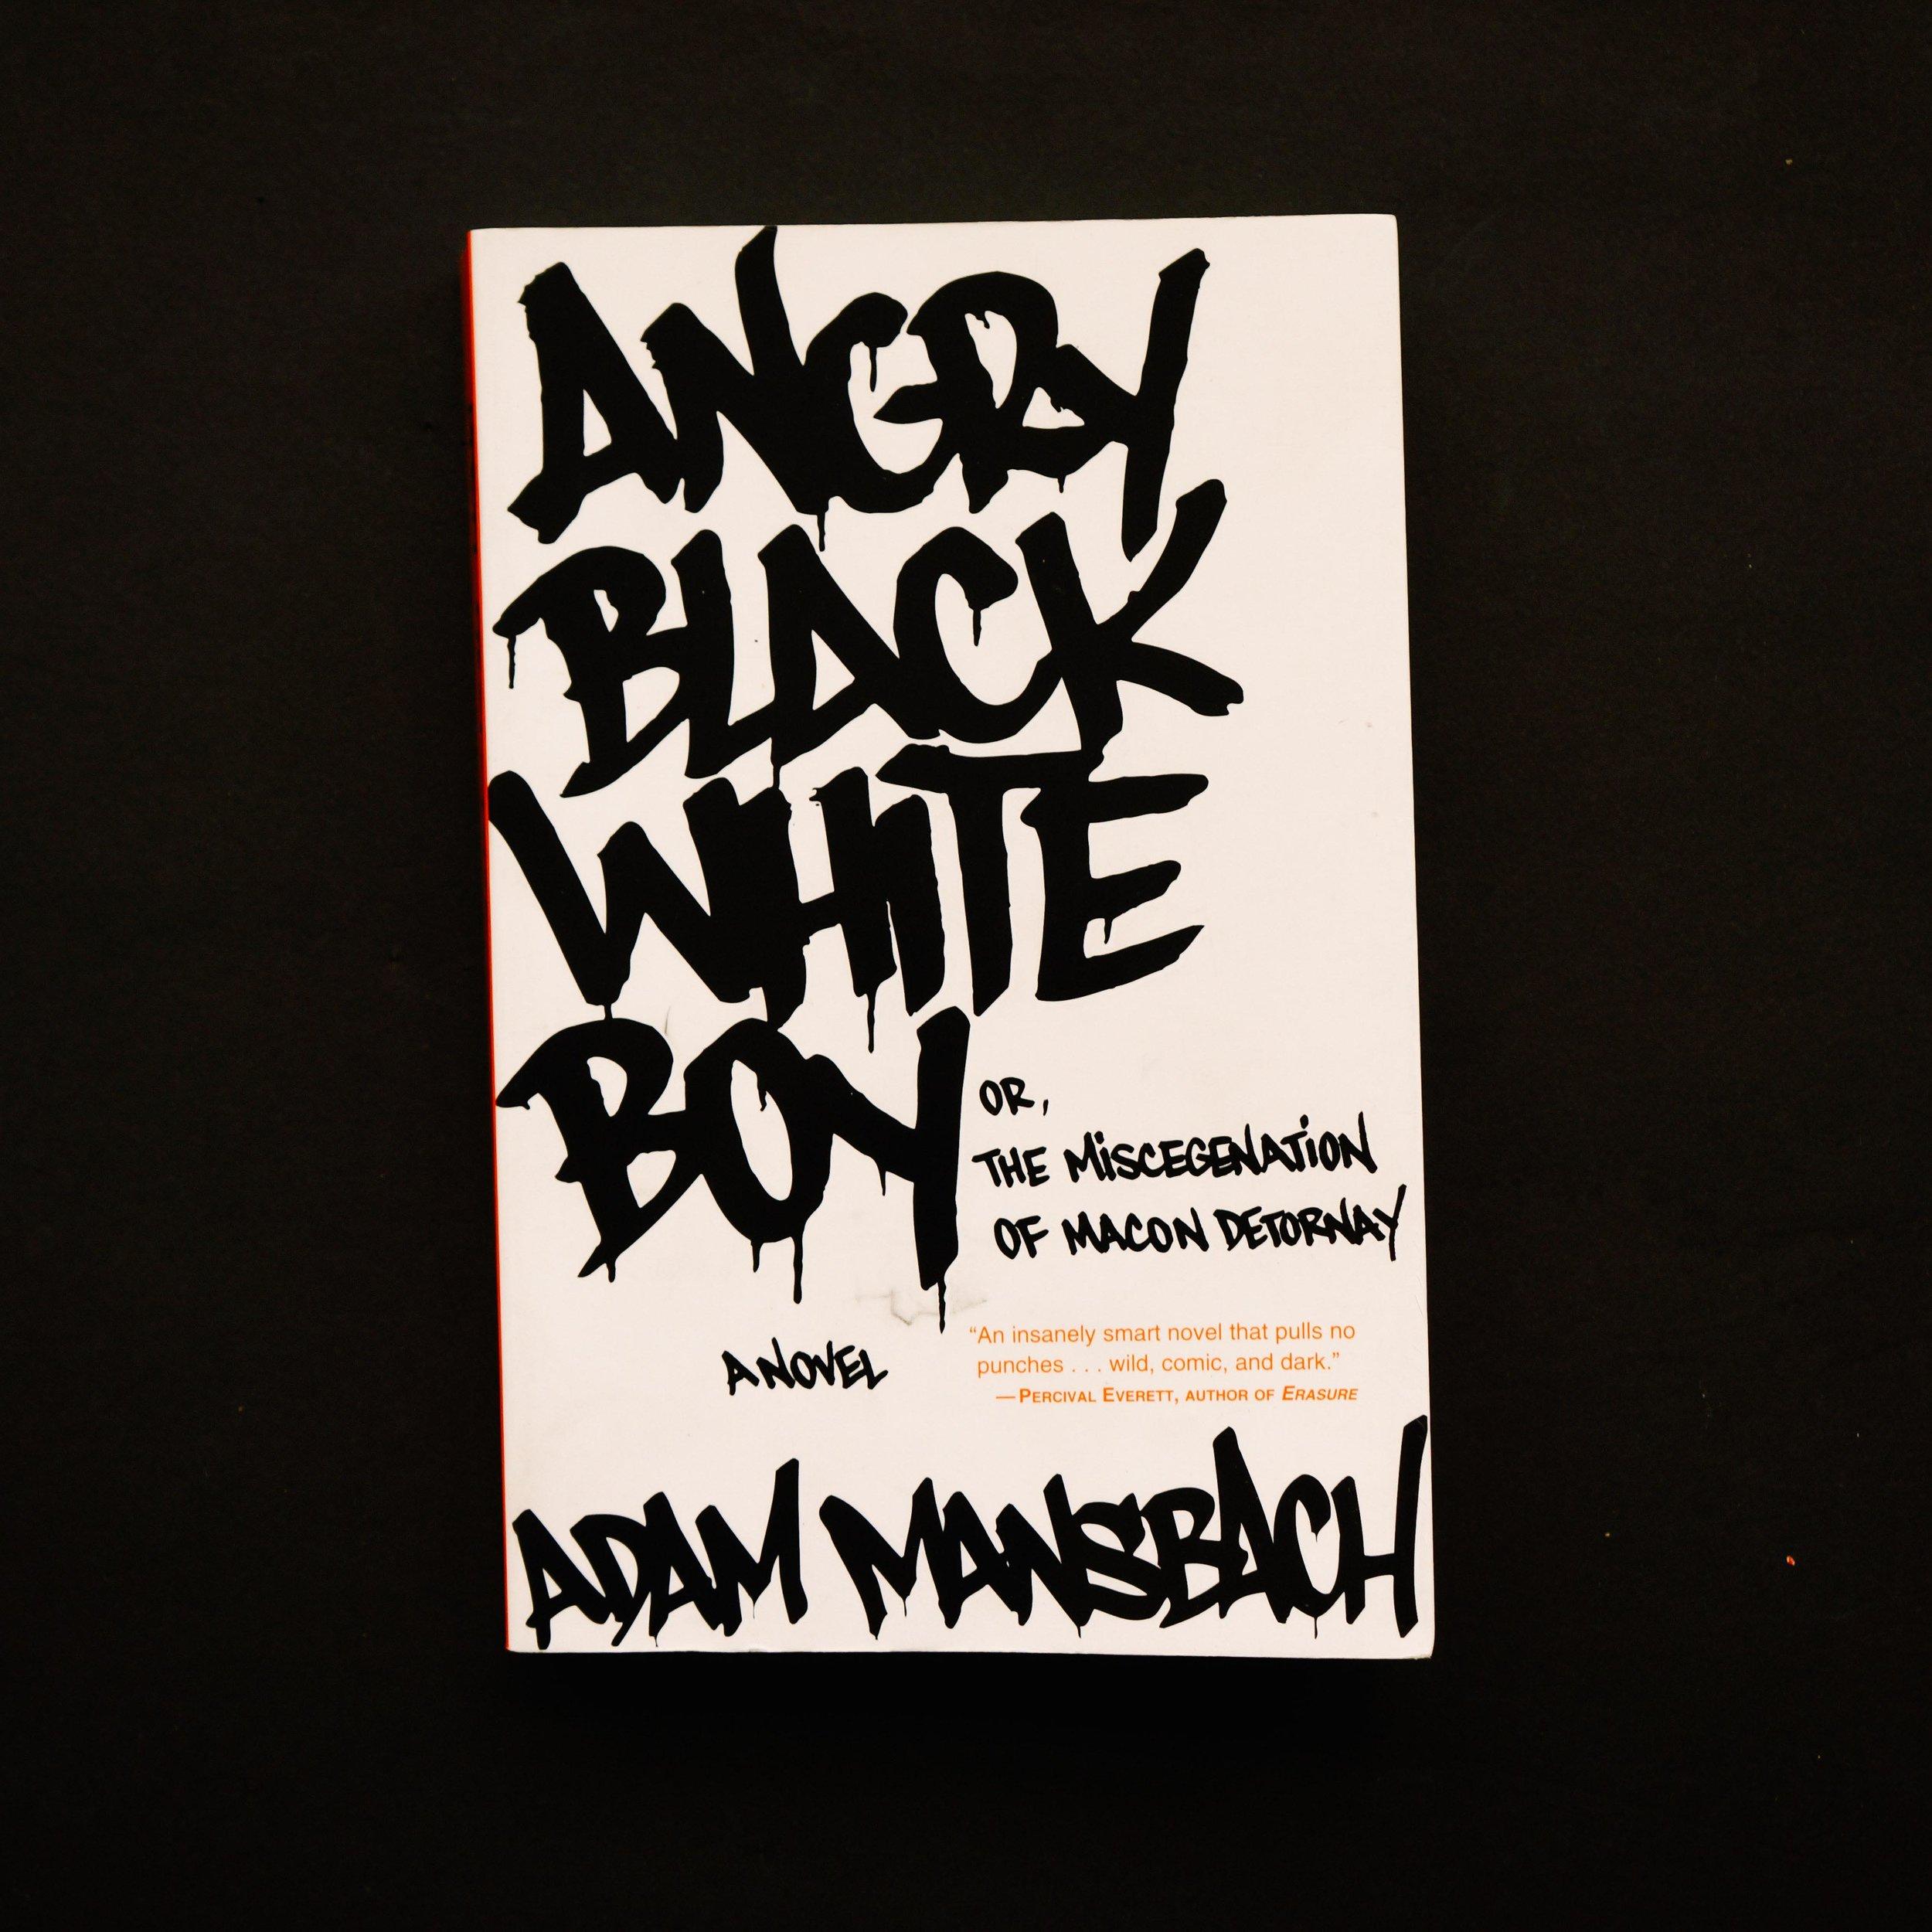 Angry Black White Boy